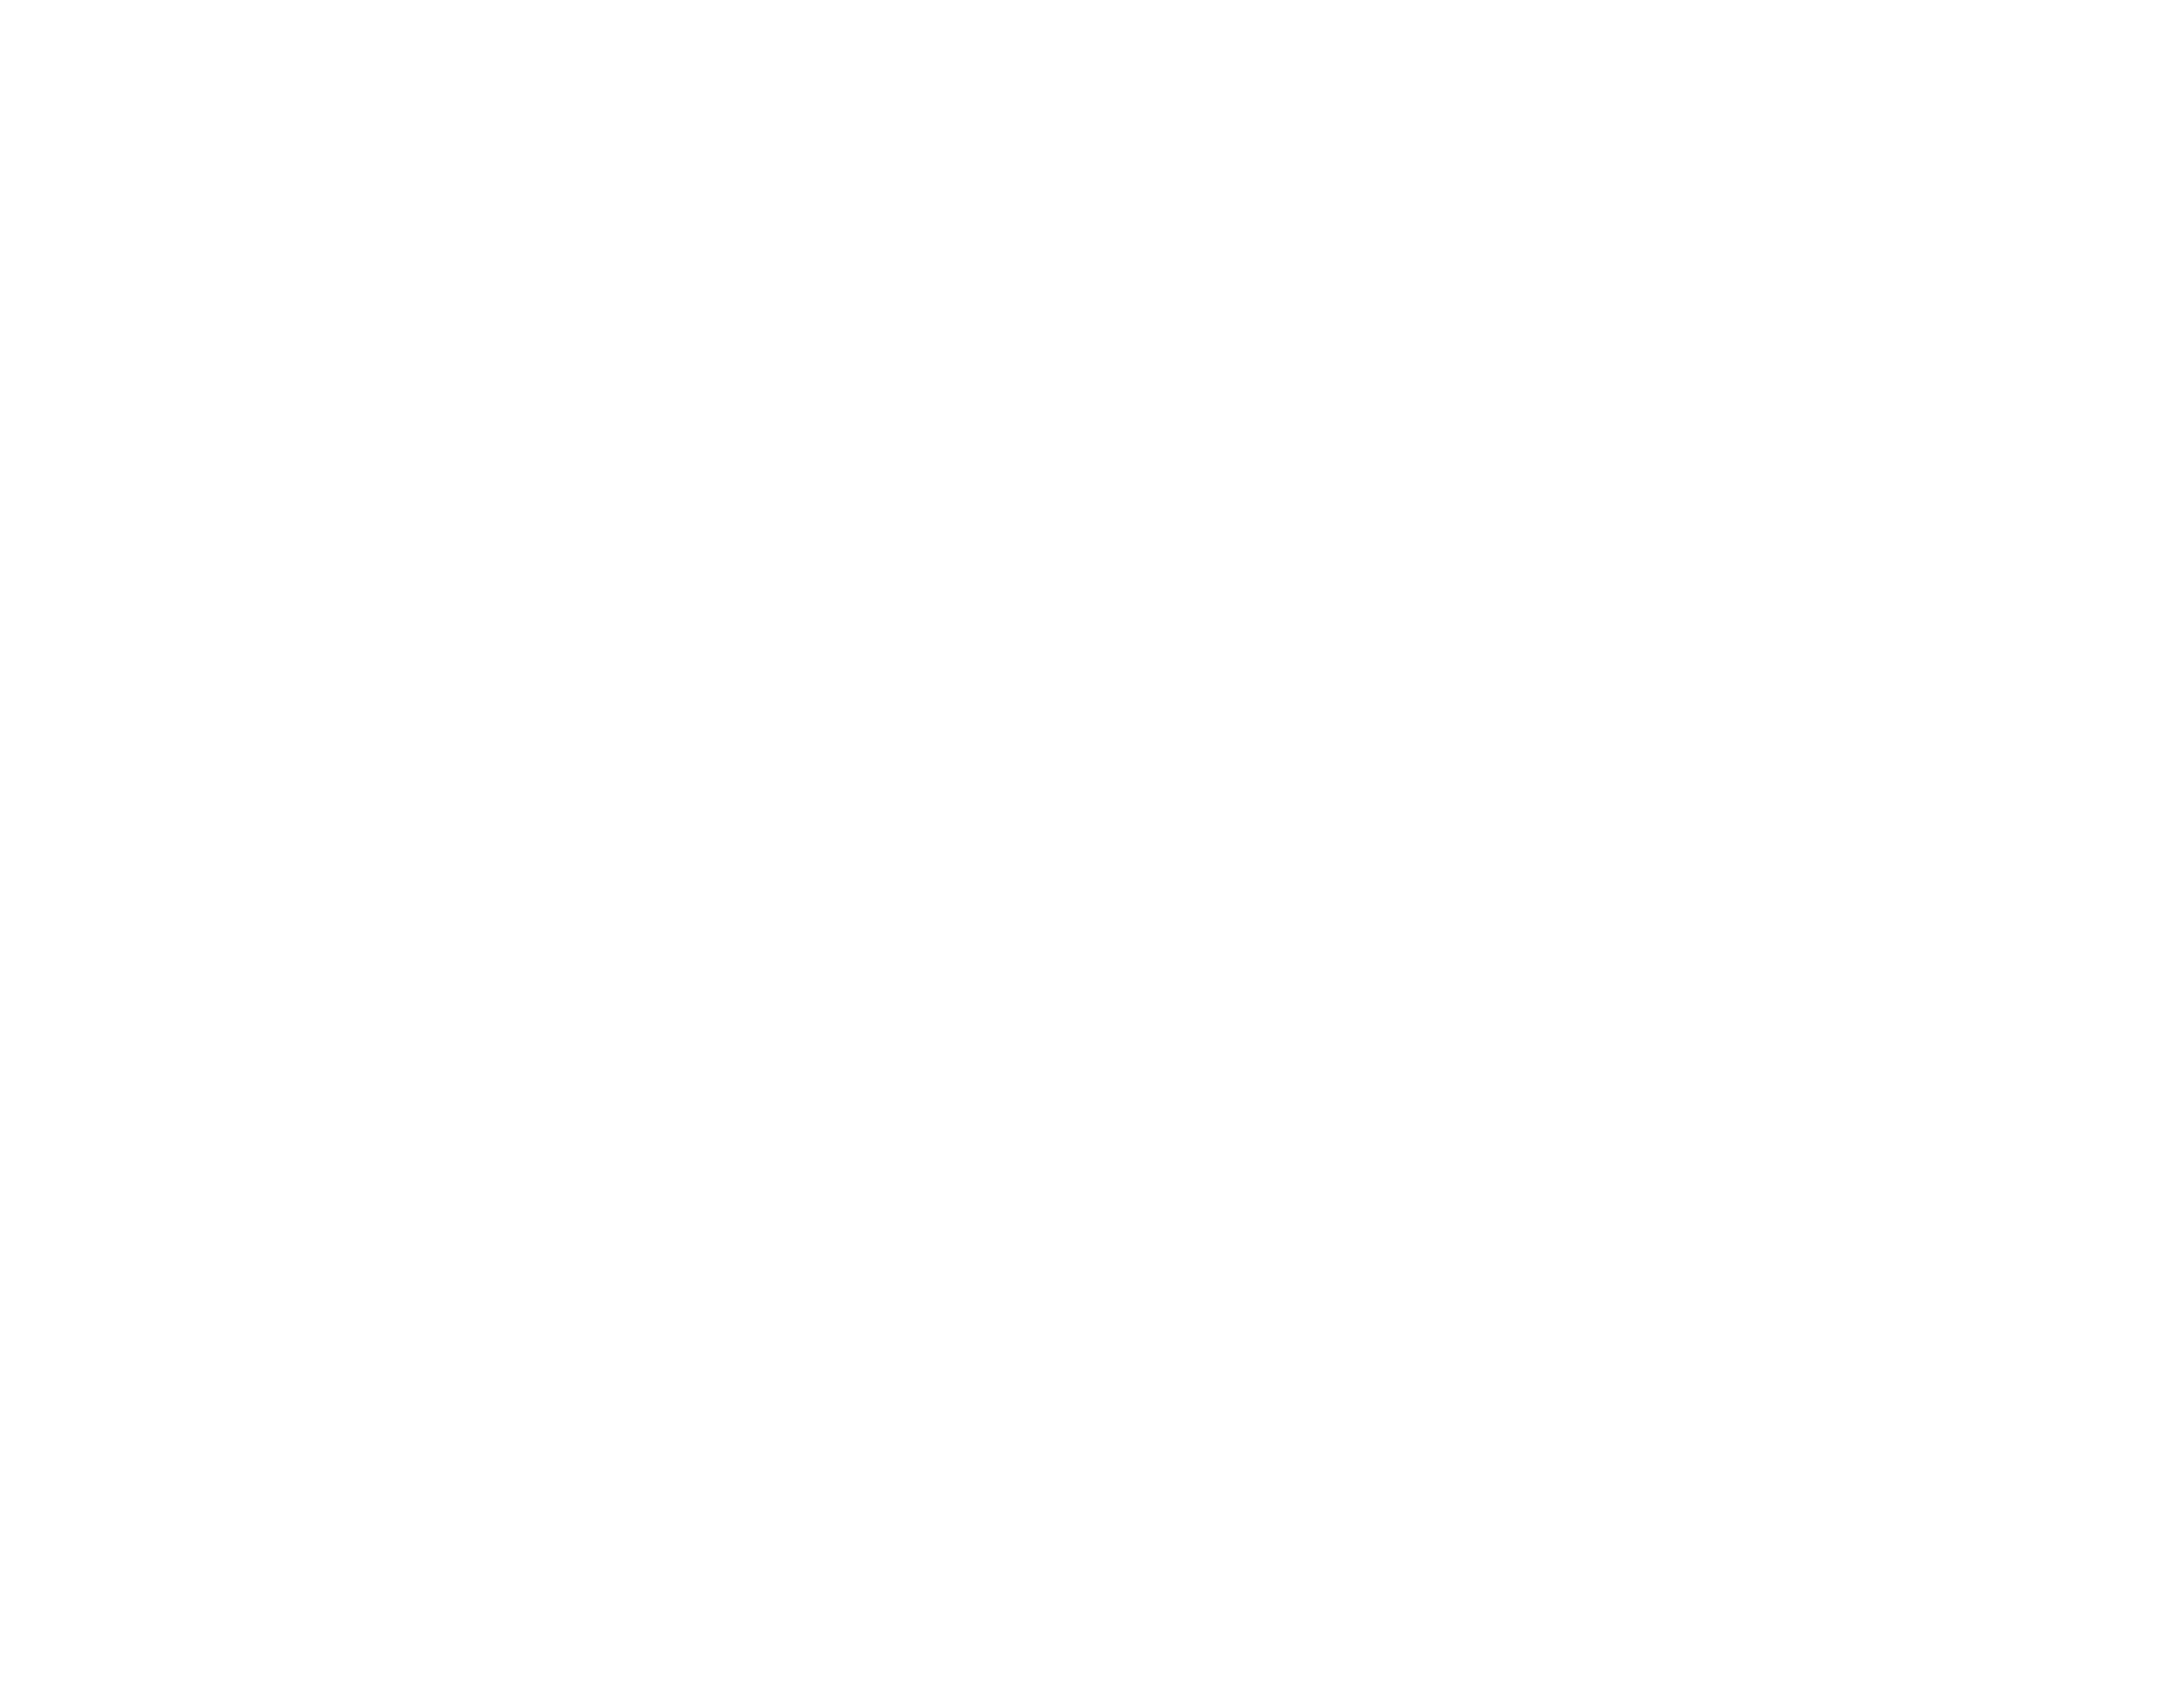 prospectors pizzeria pizza alaska historic logo